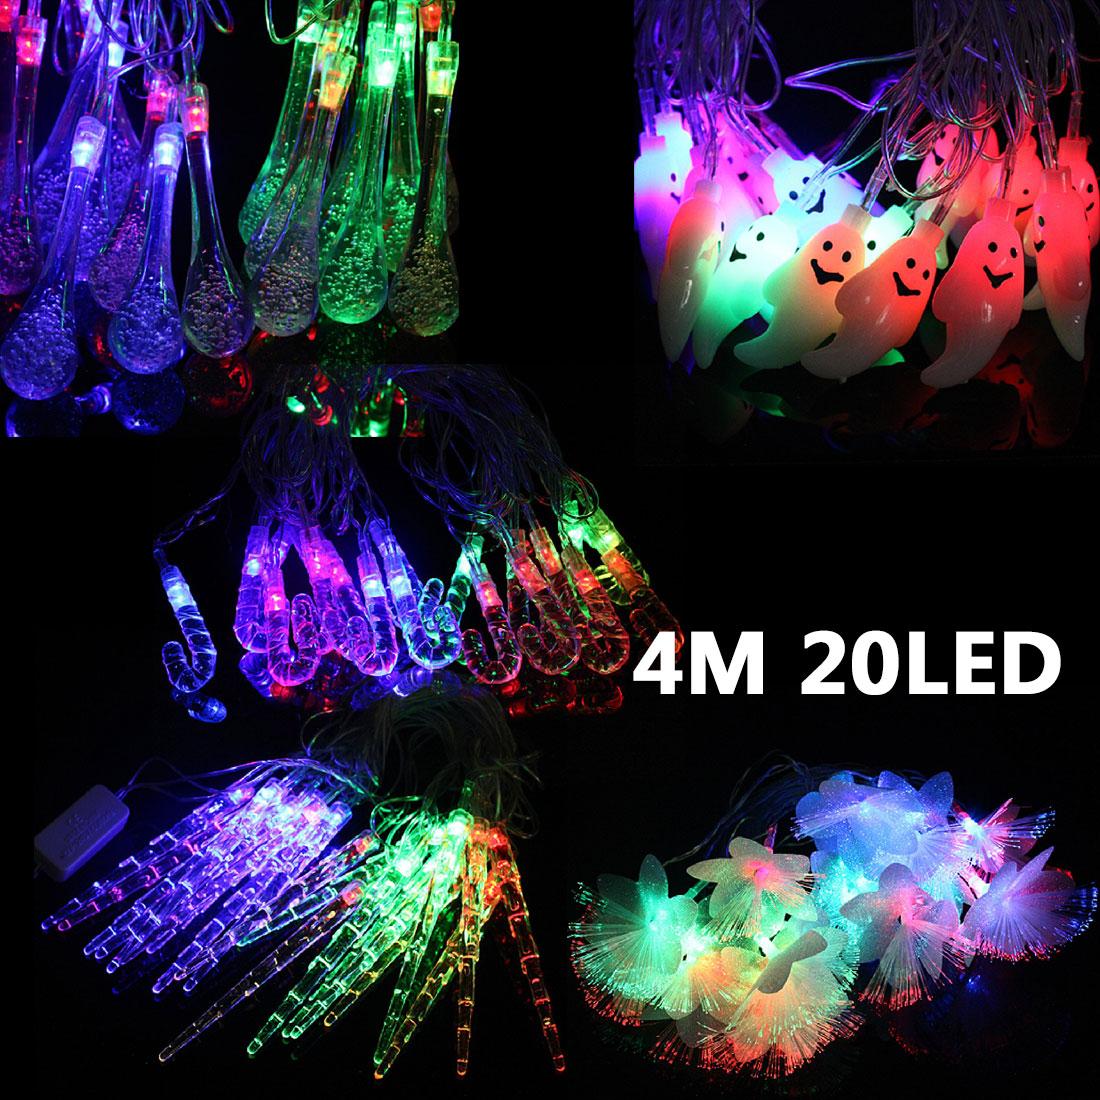 Nice 4M 20 Led String Fairy Lights Christmas Festival Decoration Multi-Color Rgb Decoration 110V/220V Rainproof(China (Mainland))